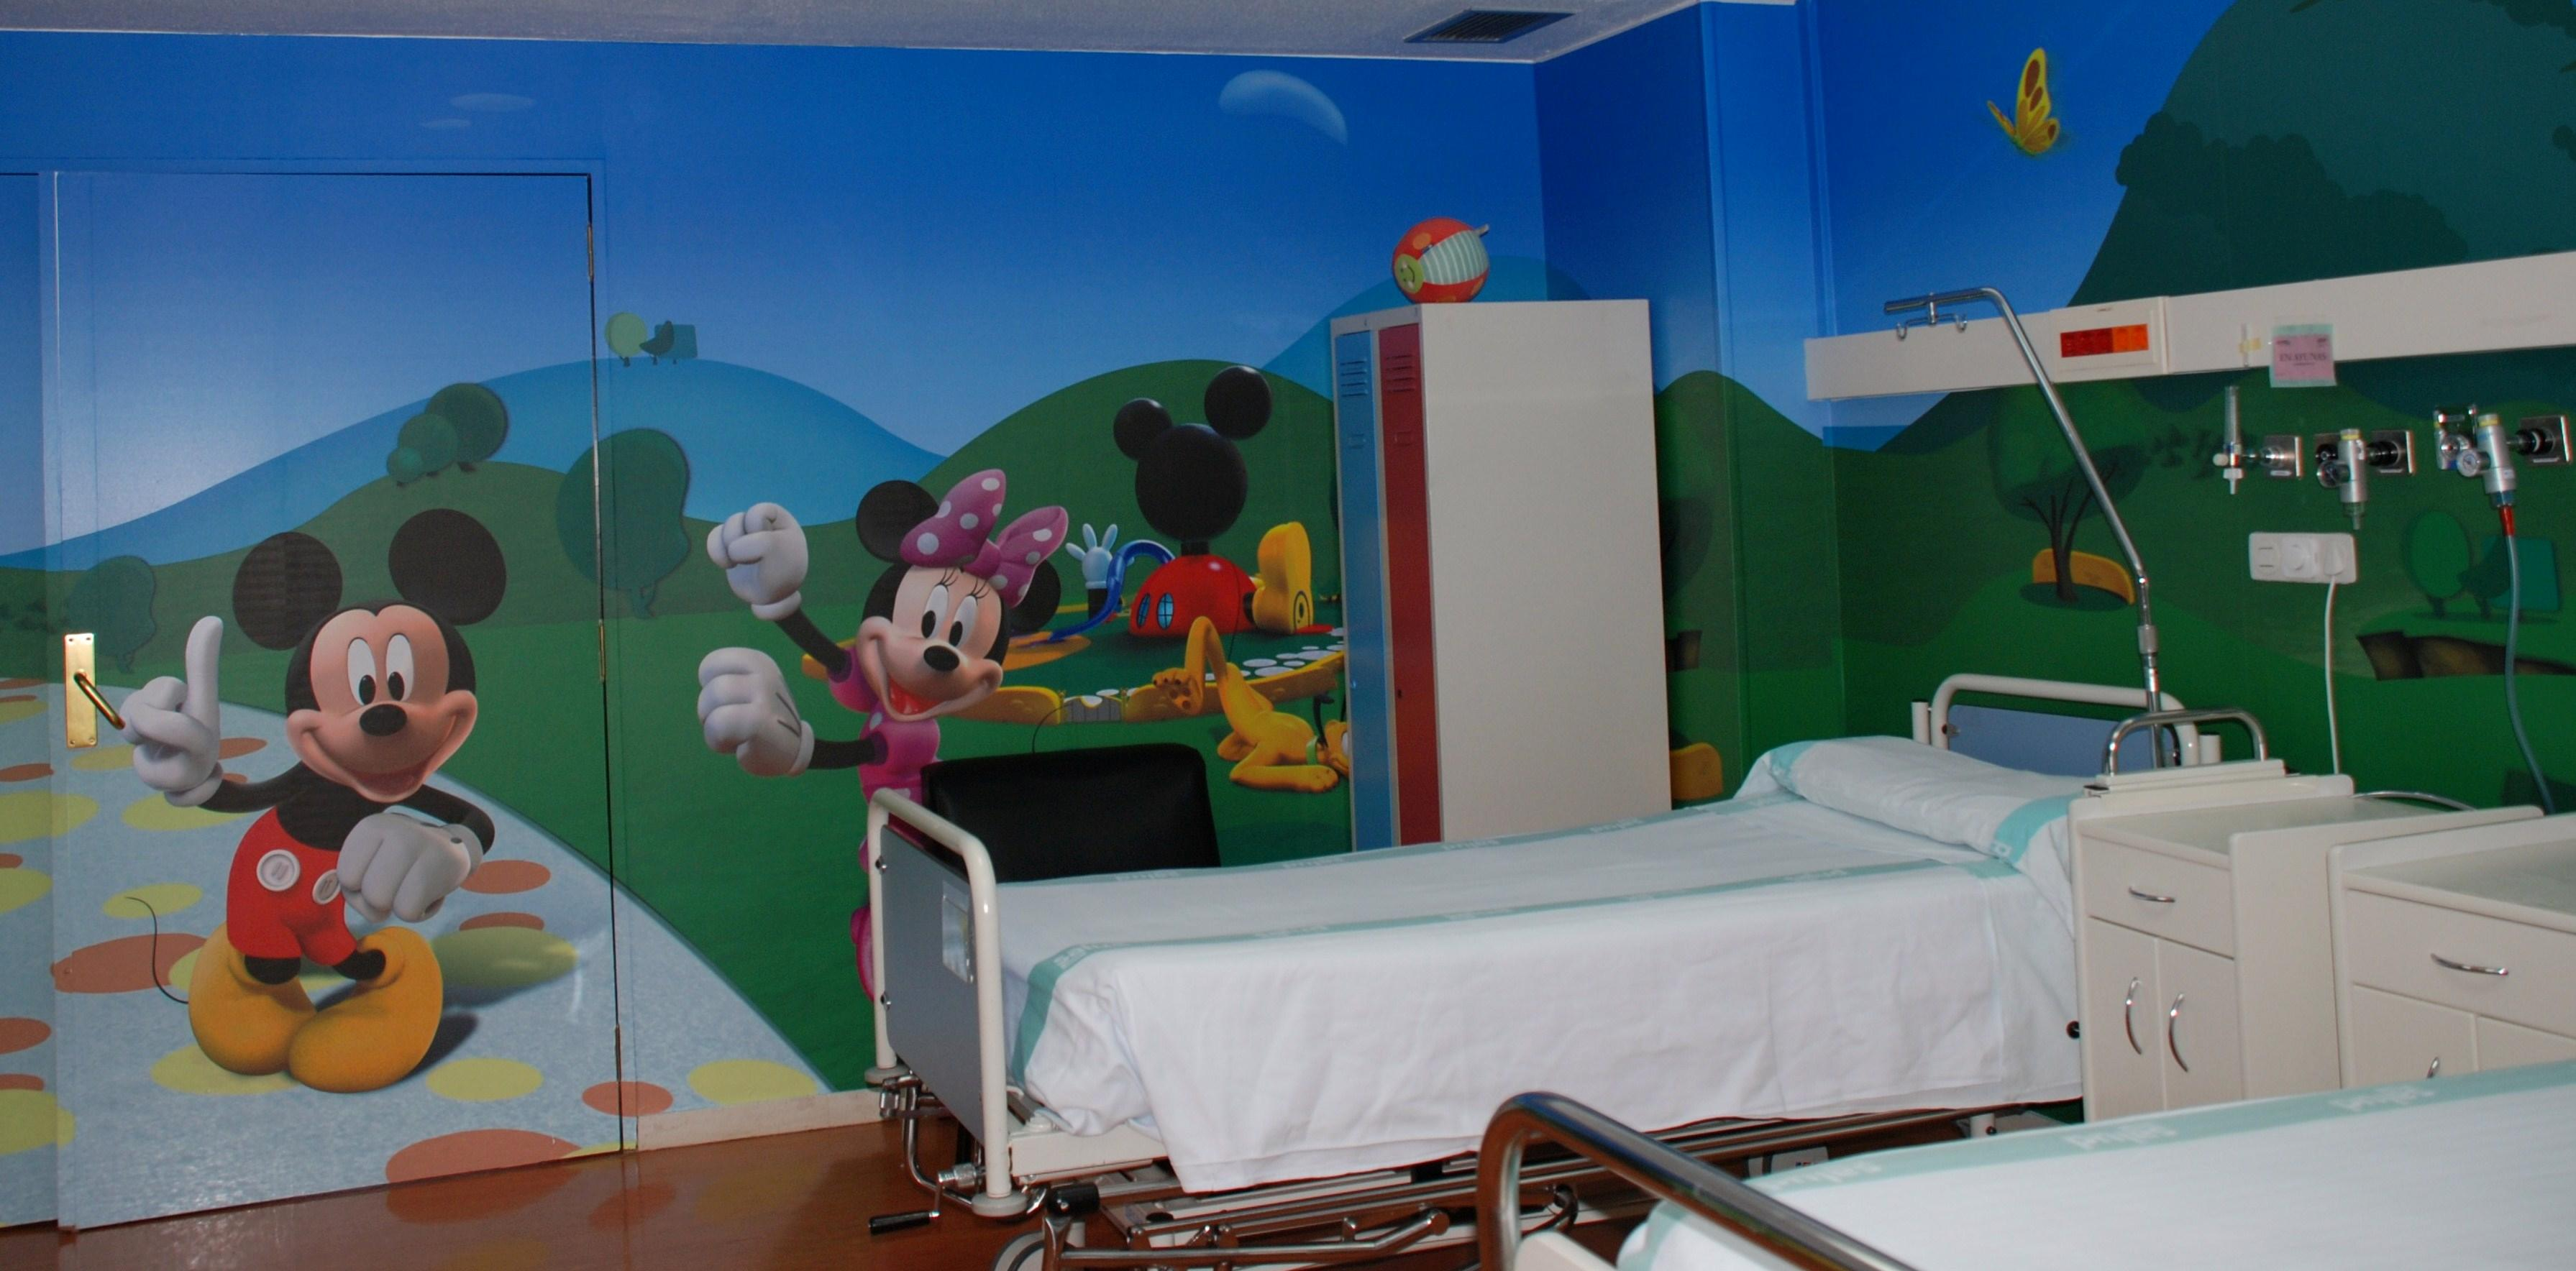 Suspenden tratamiento a 85 ni os con c ncer en bucaramanga - Hospital materno infantil la paz ...